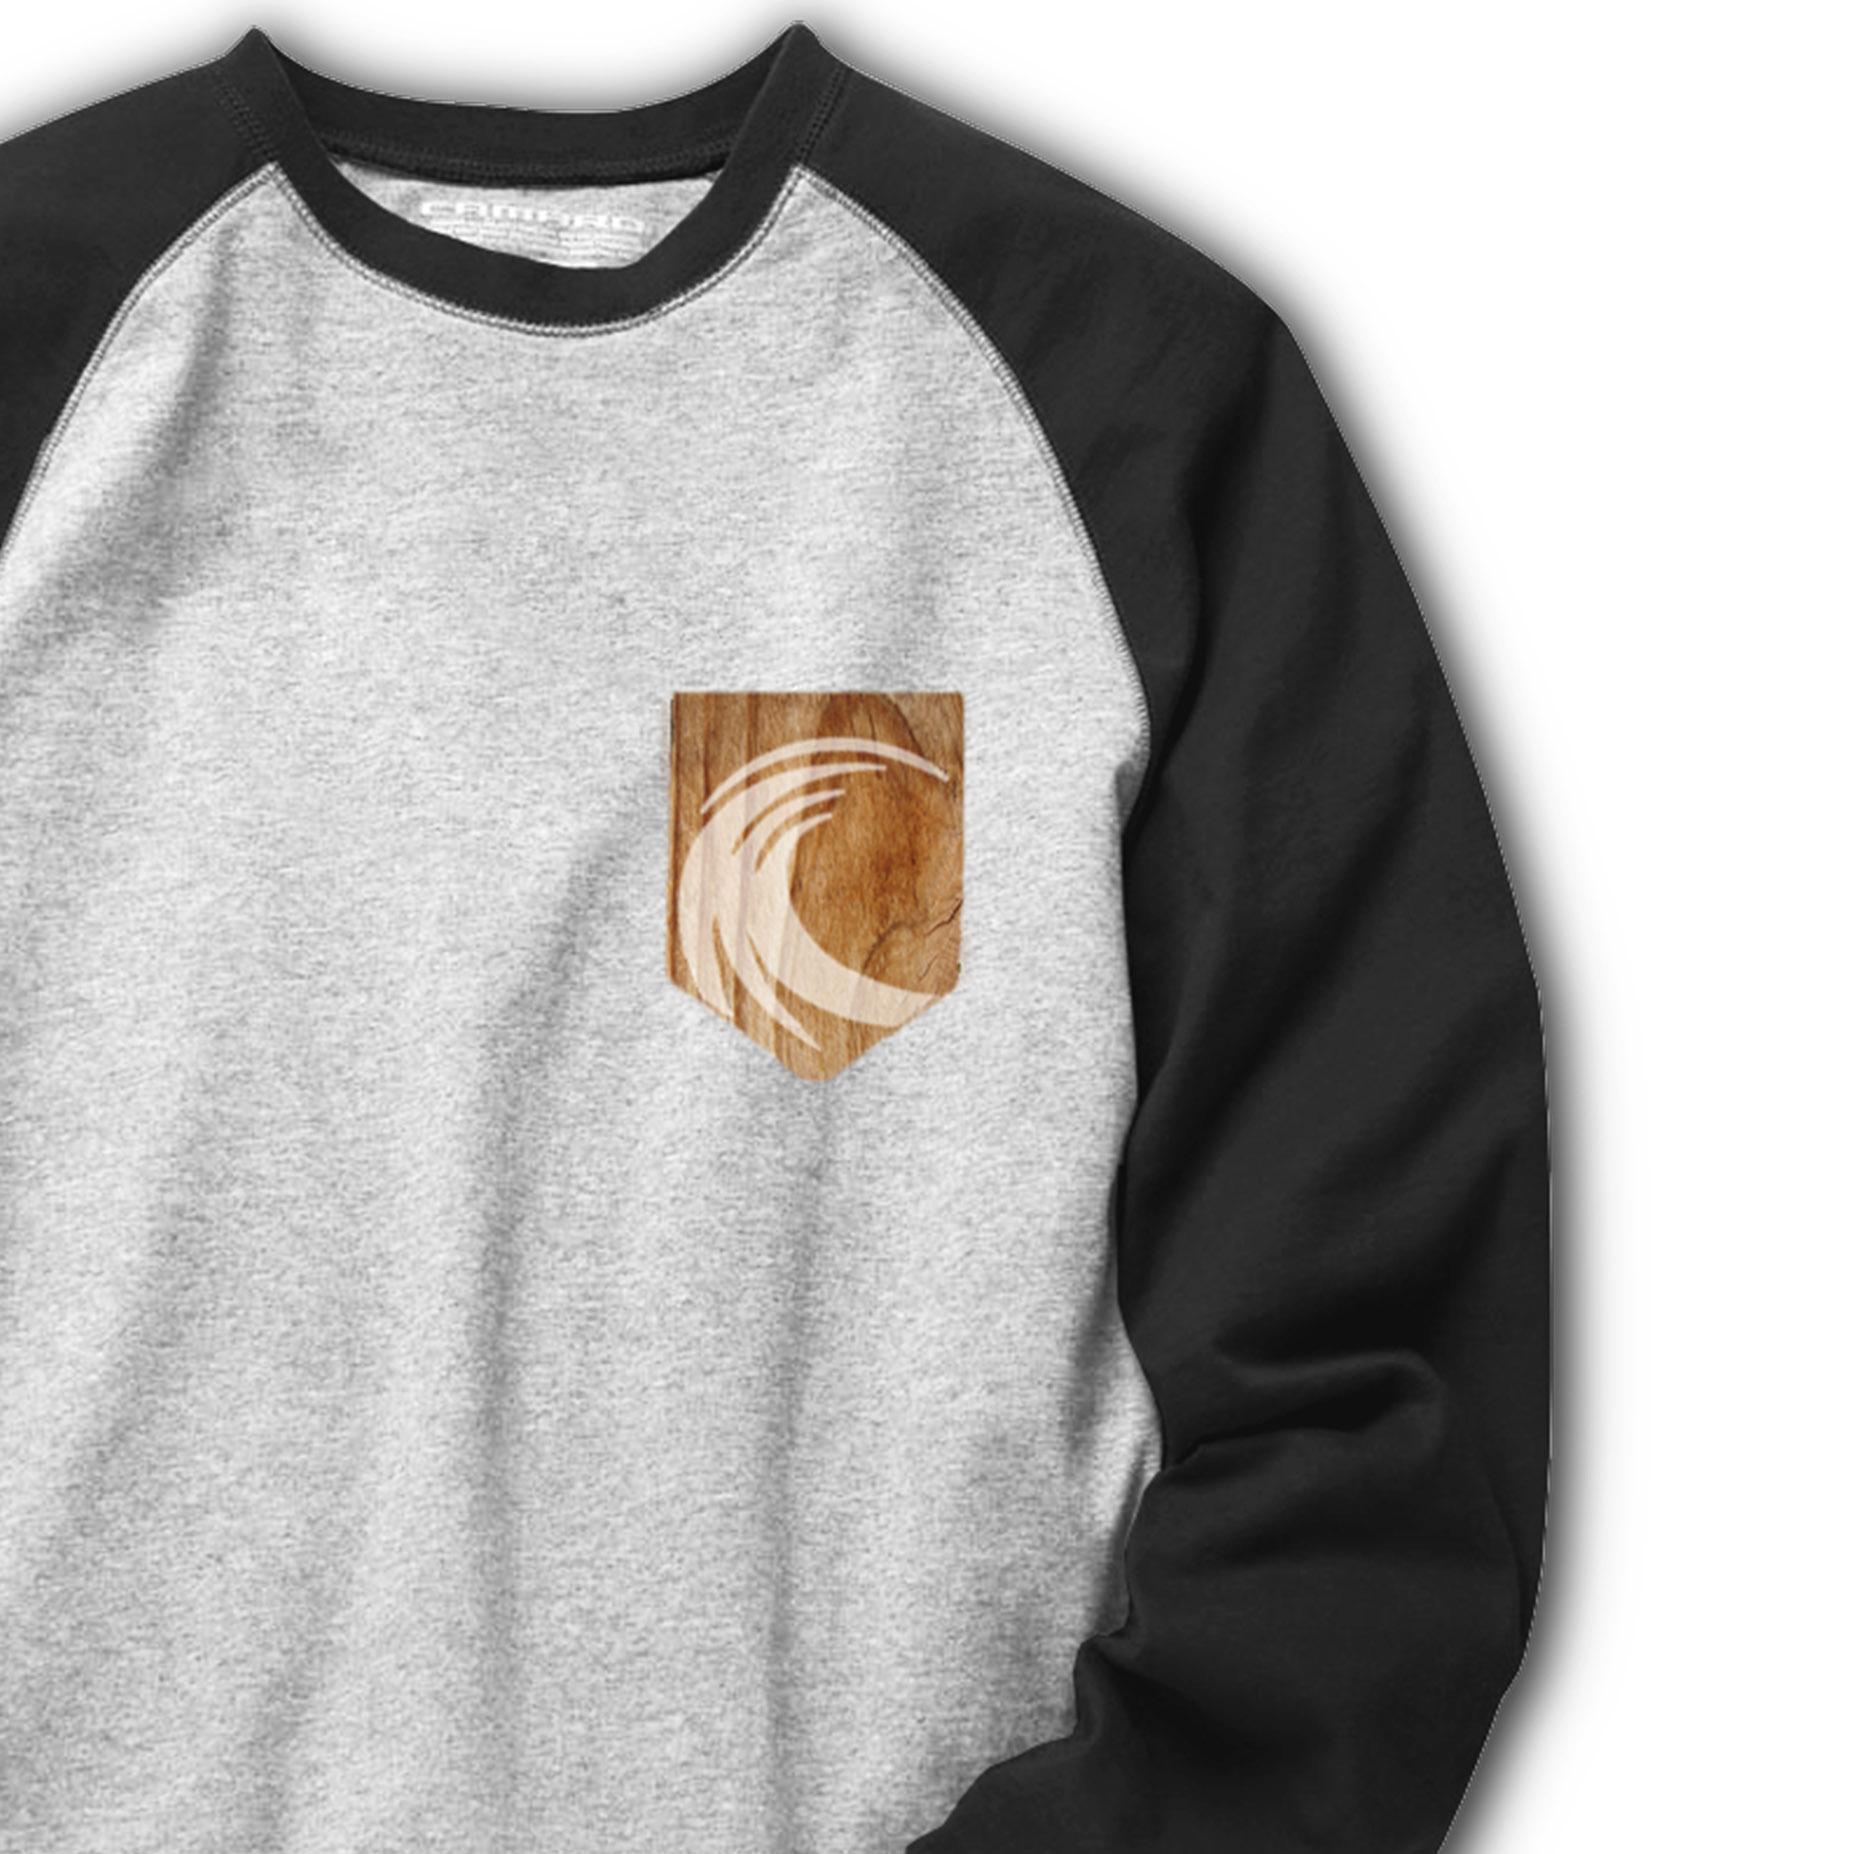 Shirt20.png